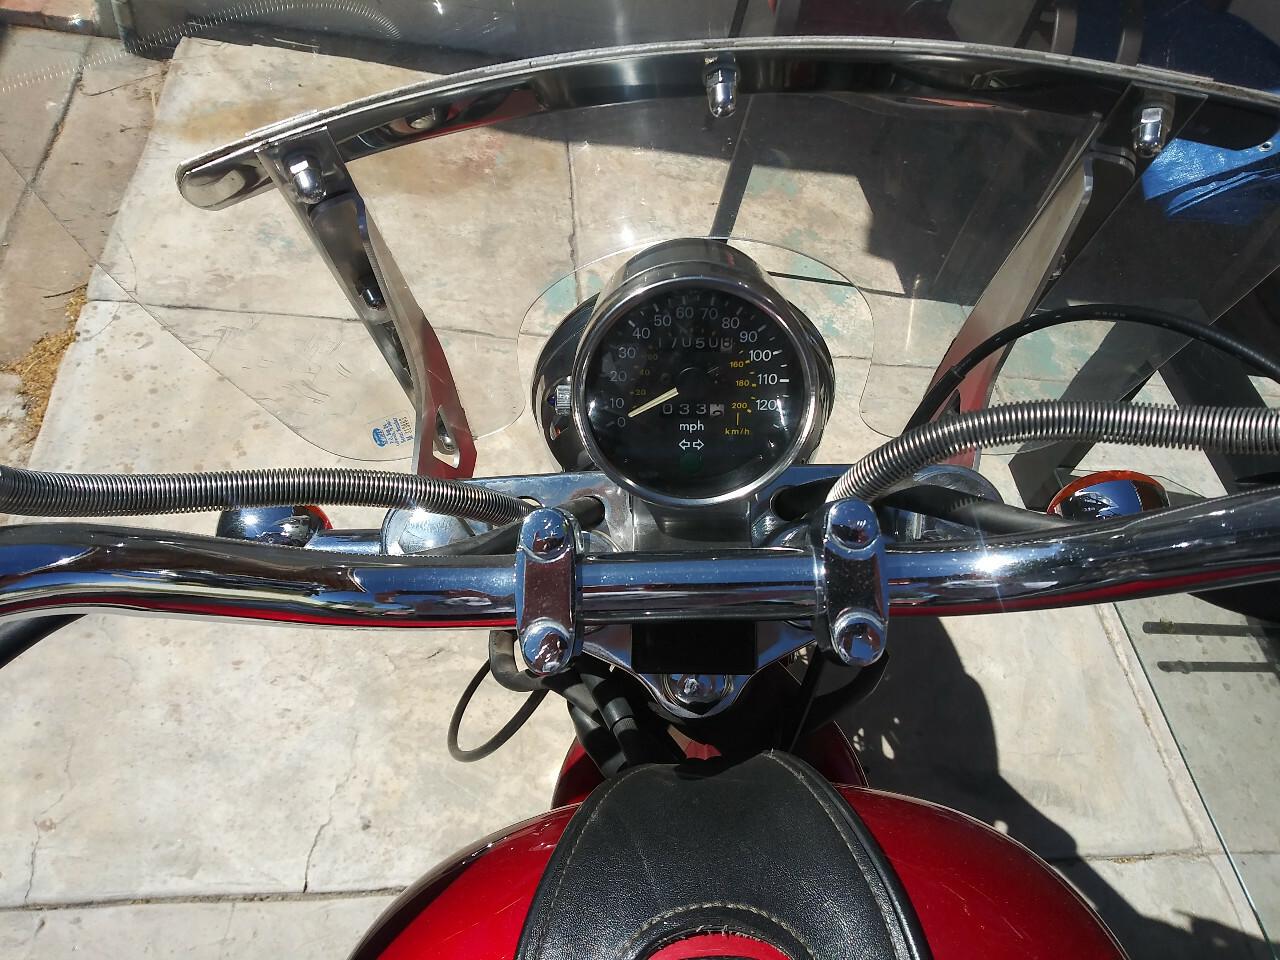 Intruder 1500 For Sale - Suzuki CRUISER Motorcycles - Cycle